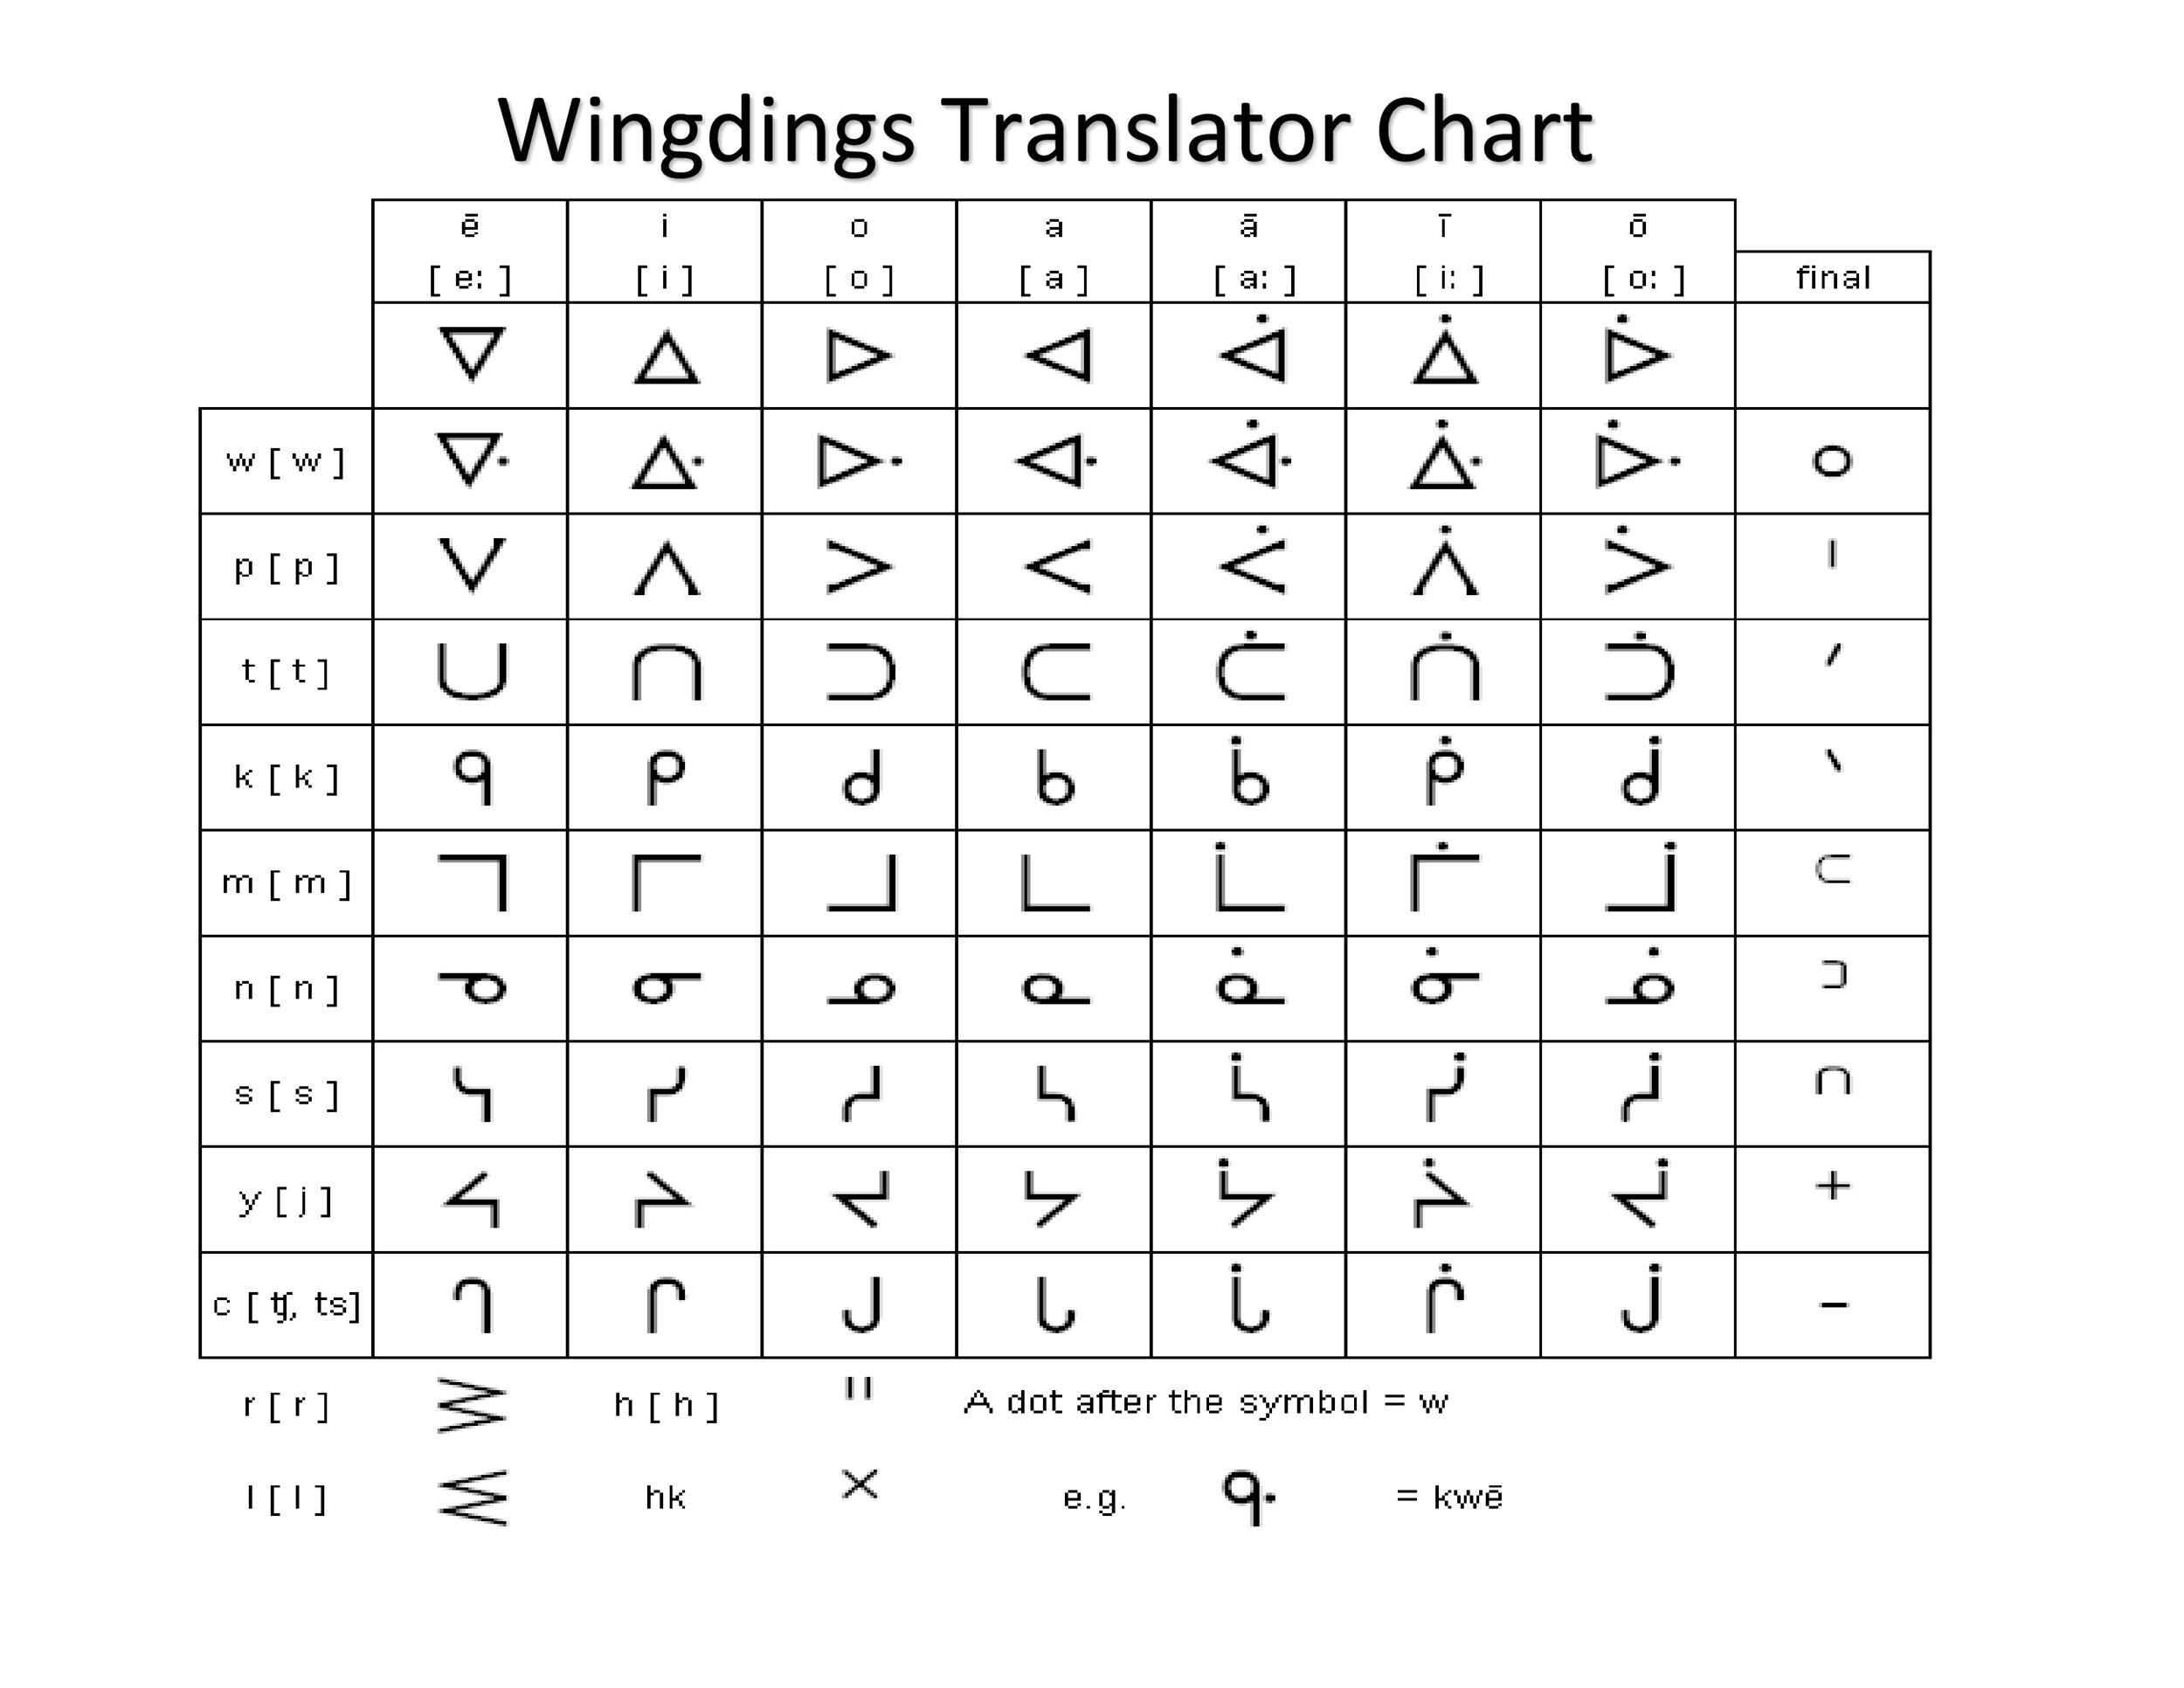 Free wingdings translator template 23